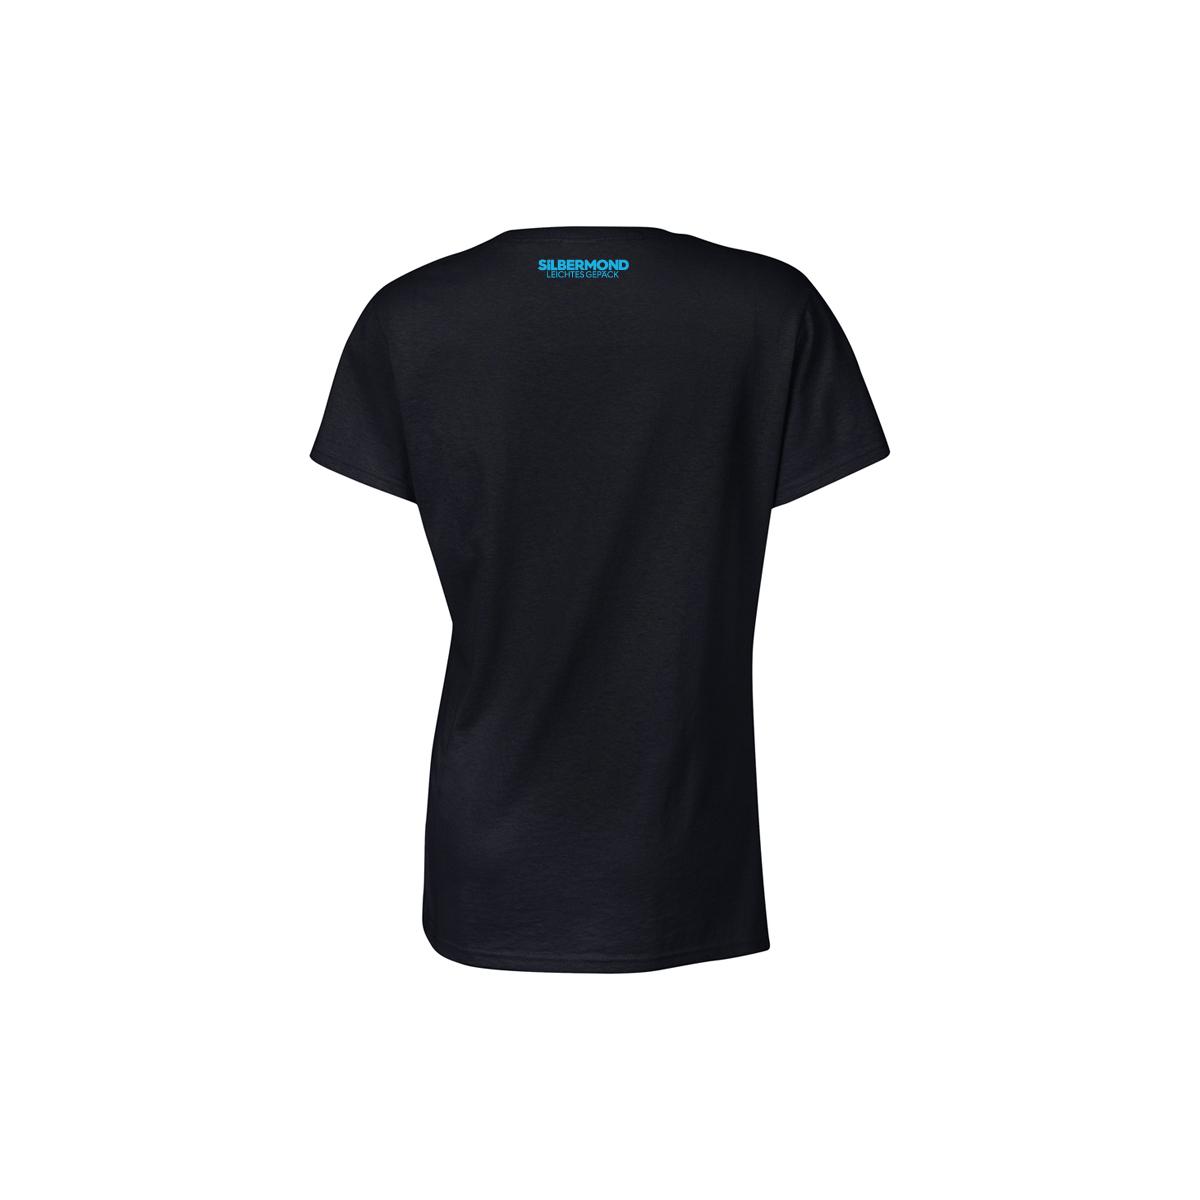 Silbermond Star Girl T-Shirt Girlie Schwarz